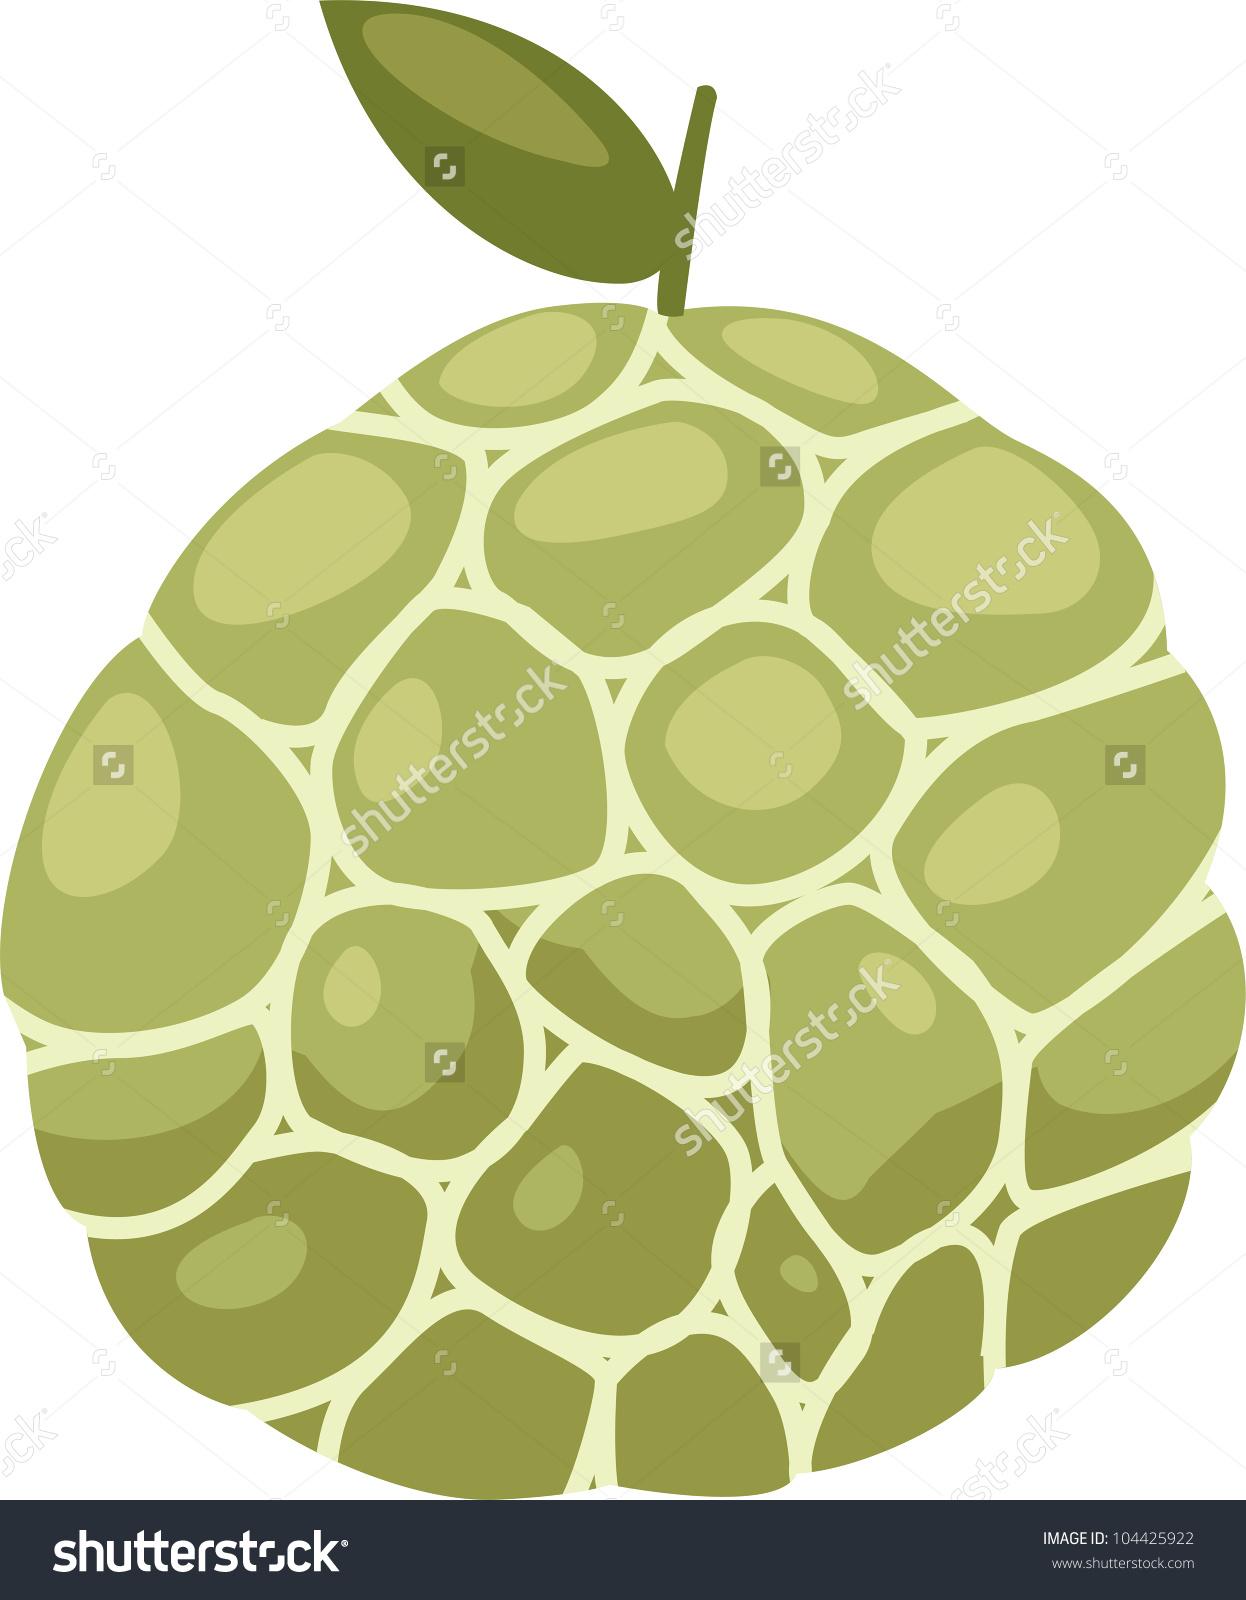 Illustration Custard Apple Vector File On White Background.